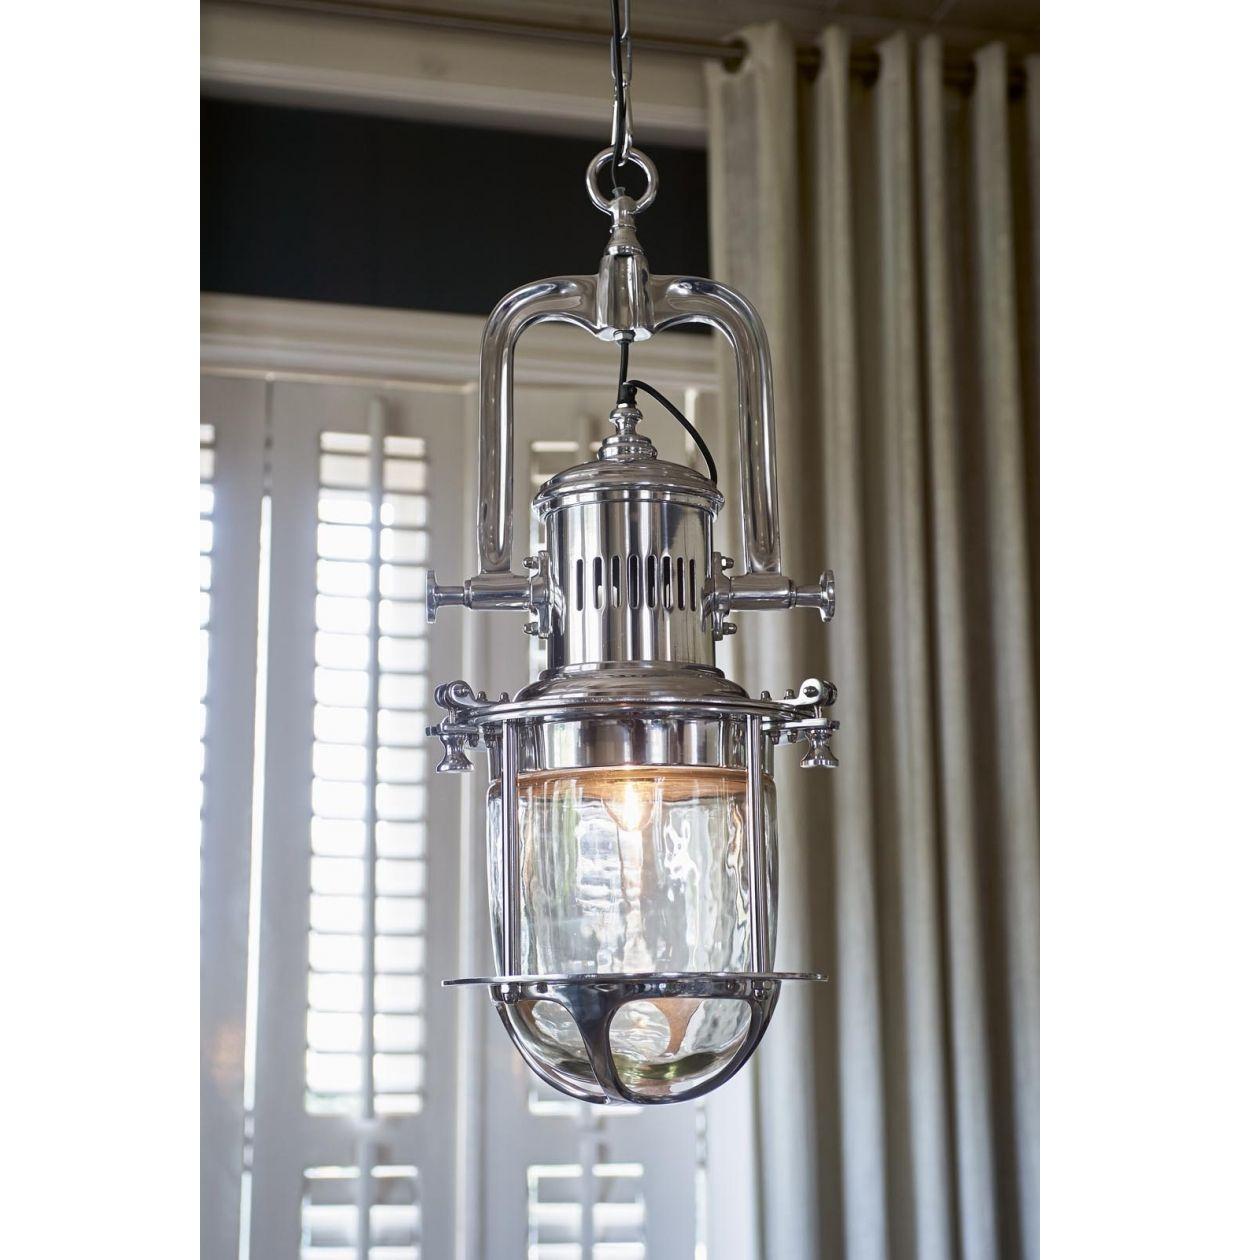 Boathouse Hanging Lamp - Lampen & Lampenschirme | Rivièra Maison ...